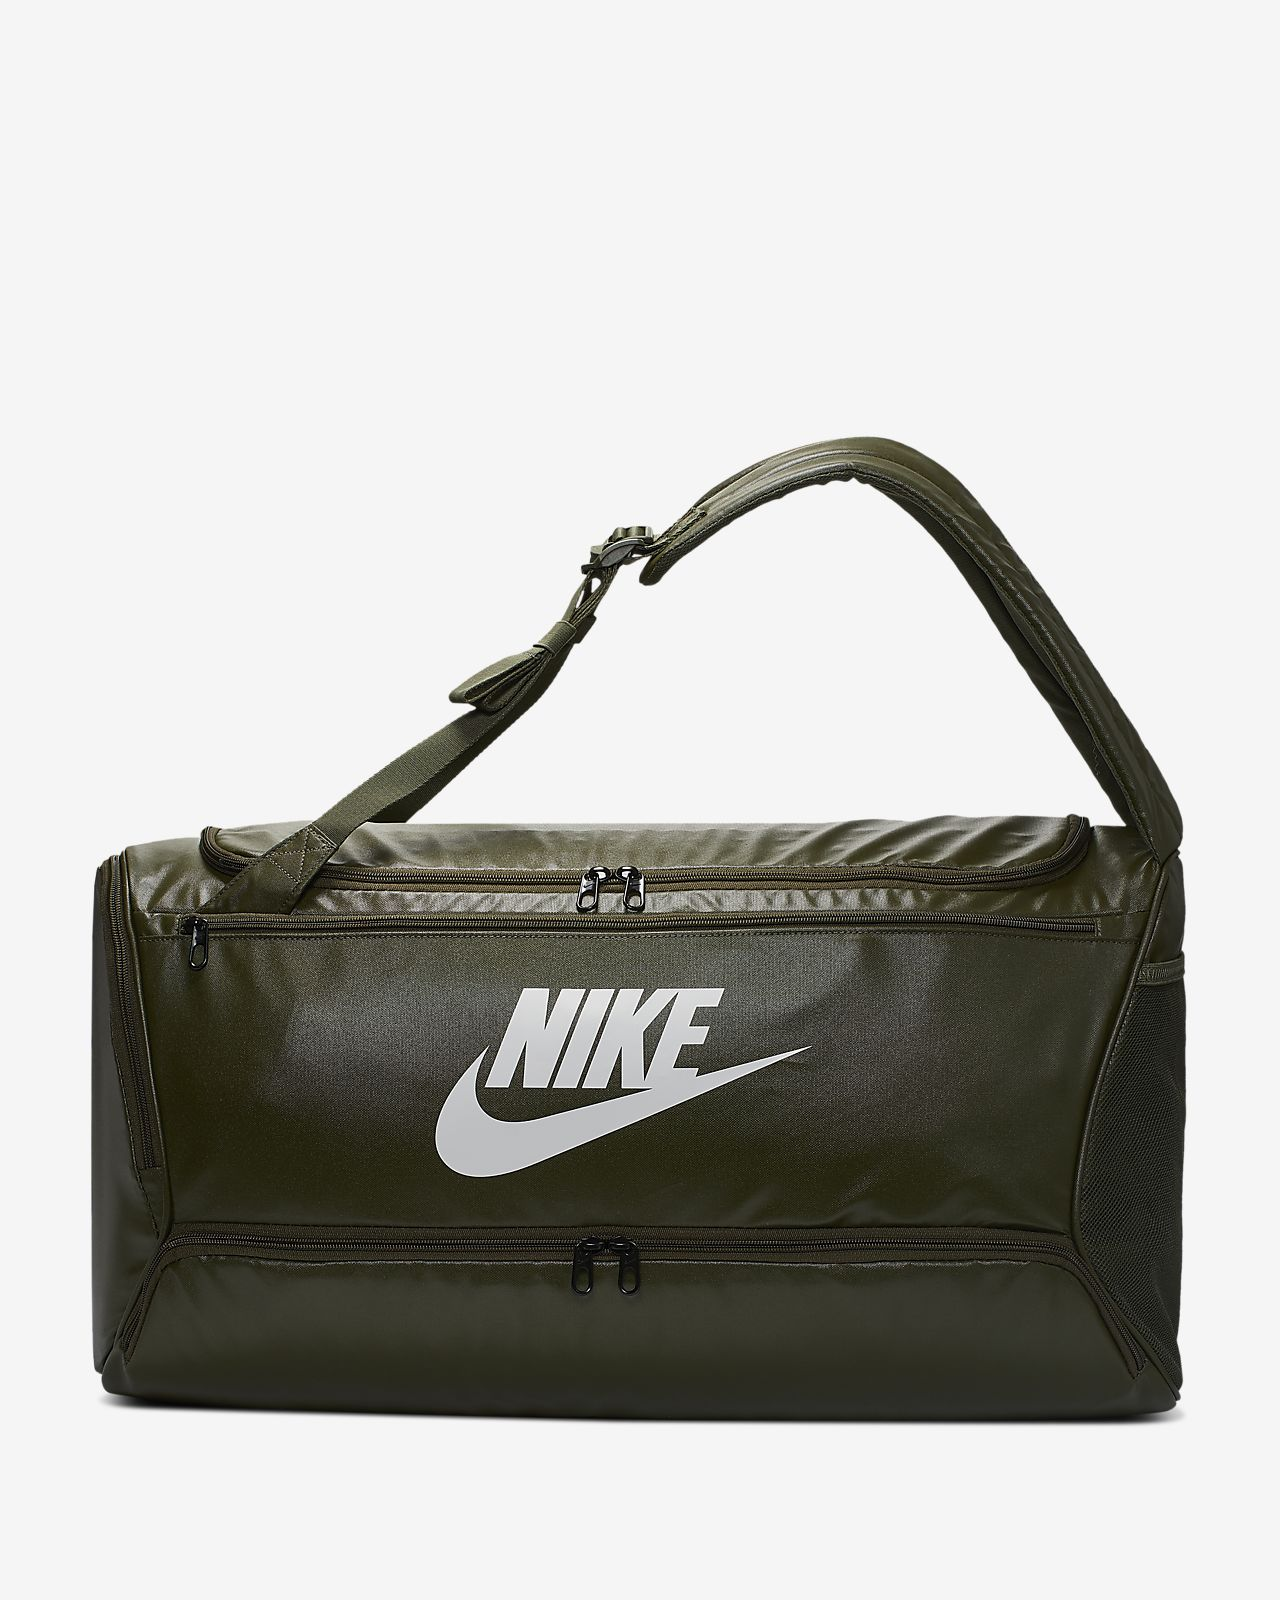 Mochila/bolso de lona de entrenamiento convertible Nike Brasilia